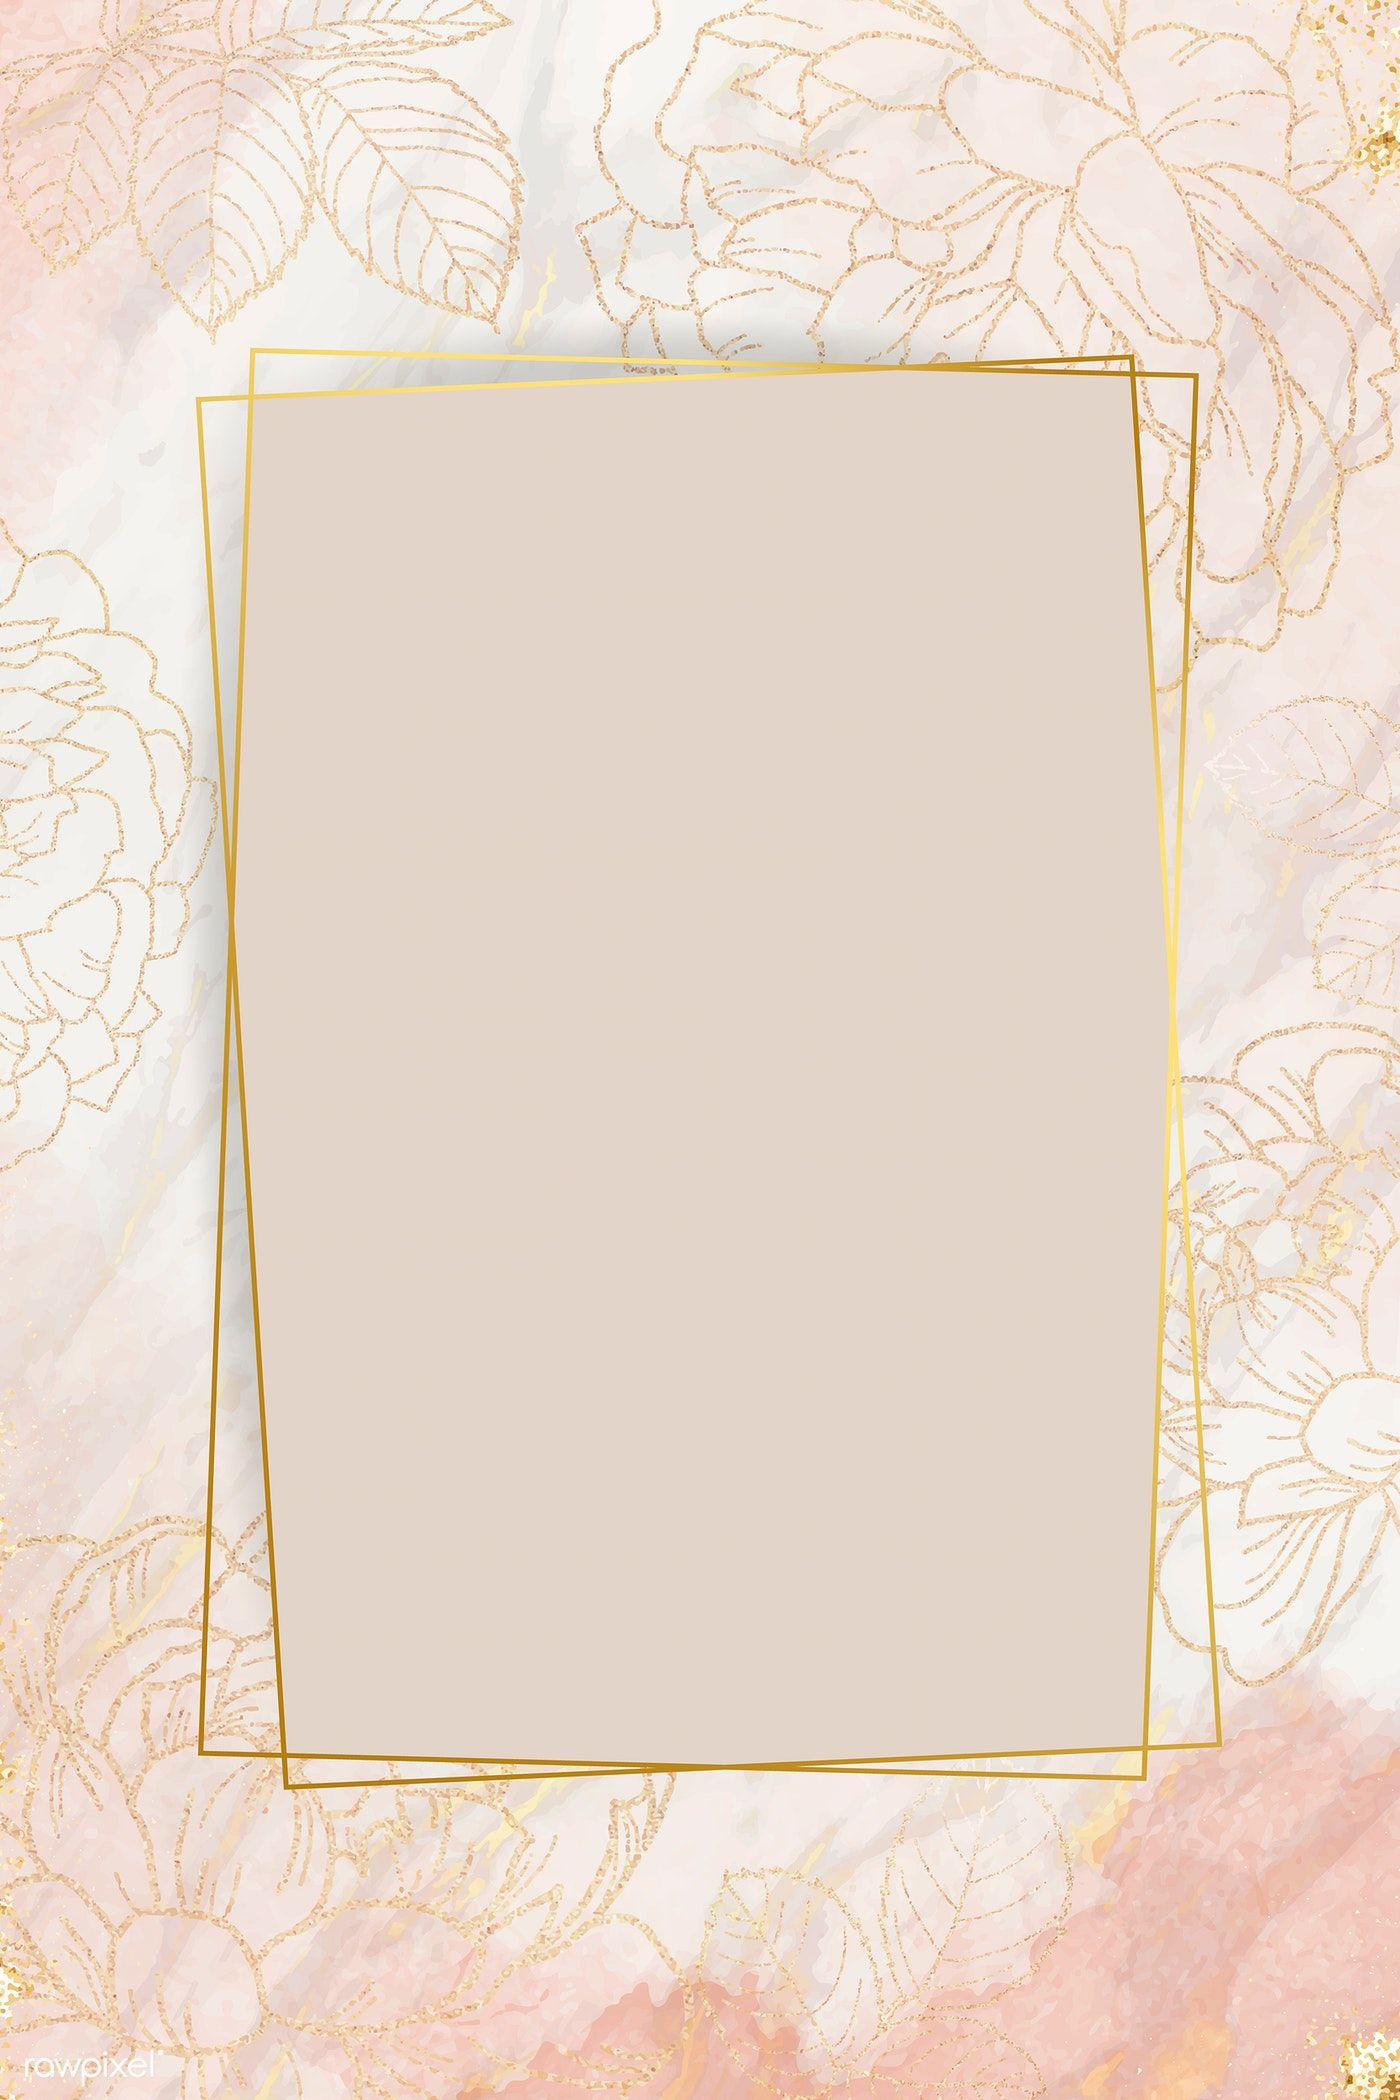 Download Premium Vector Of Pink Golden Floral Frame Vector 1211898 Flower Background Wallpaper Flower Graphic Design Framed Wallpaper Aesthetic background wallpaper golden